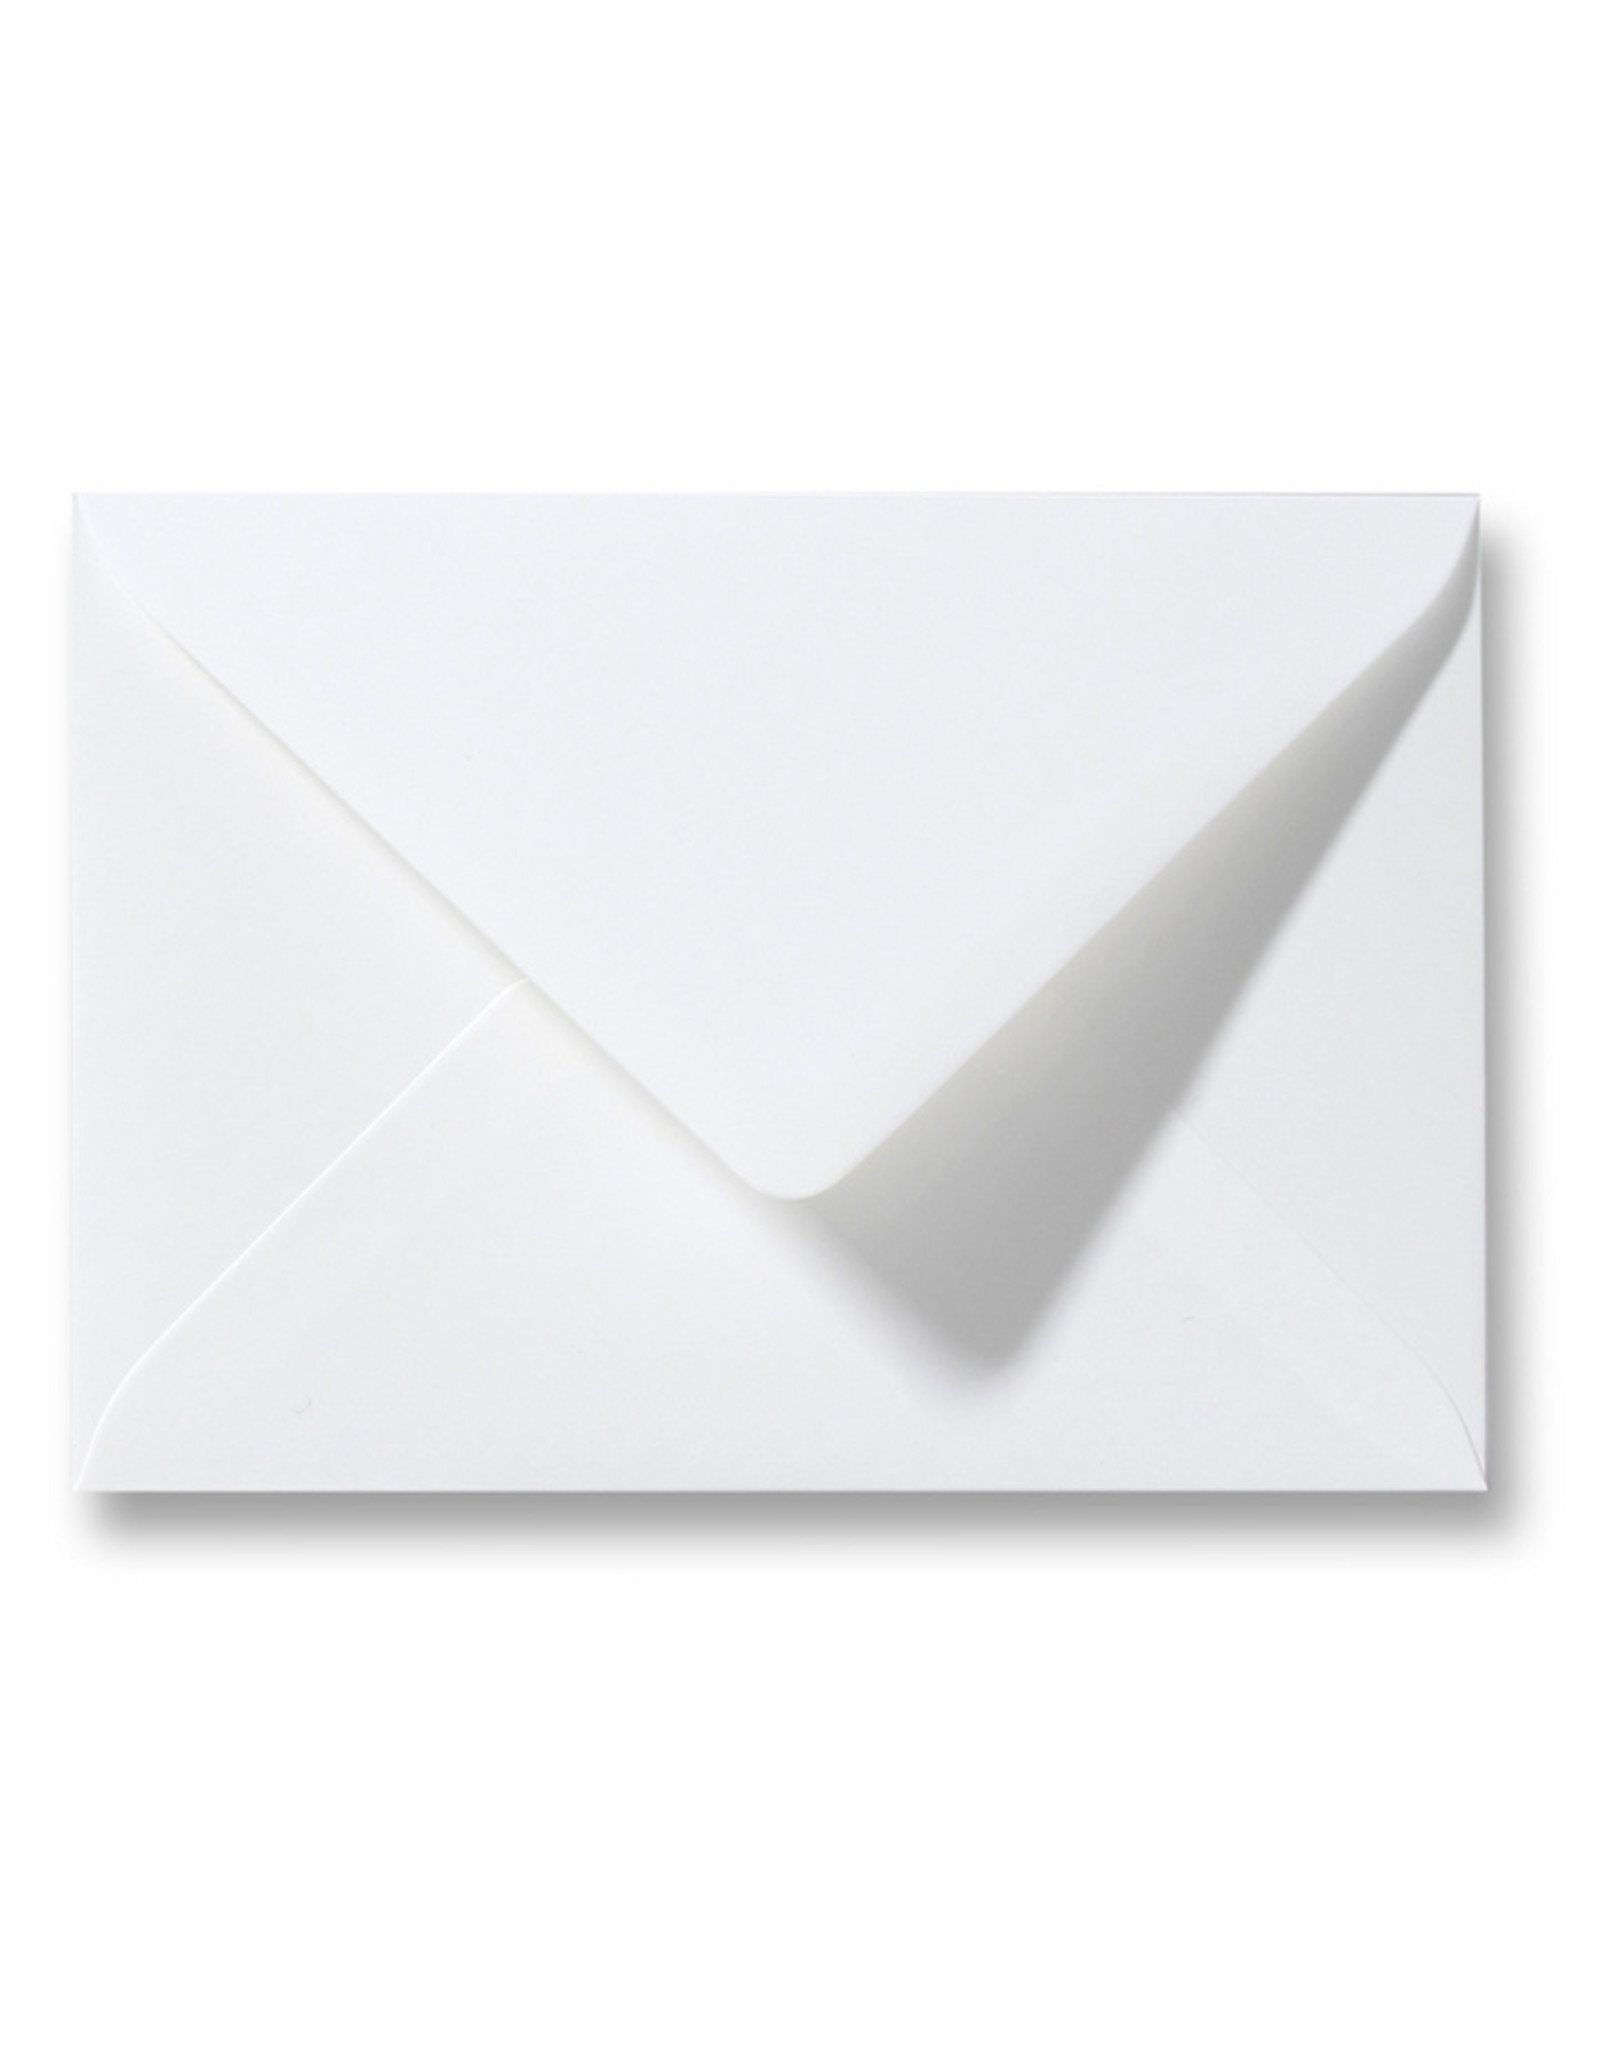 www.Robin.cards Blanco effen envelop  Biotop